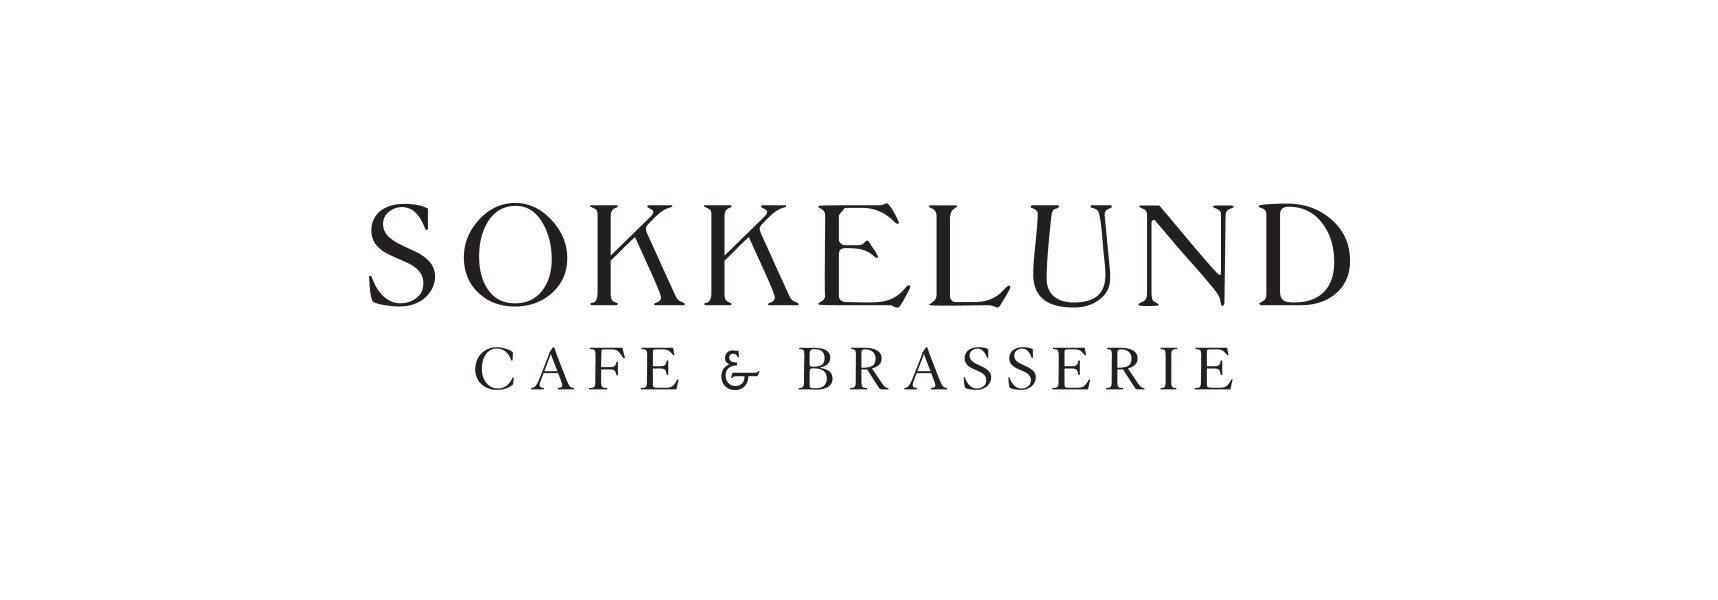 sokkelund-logo